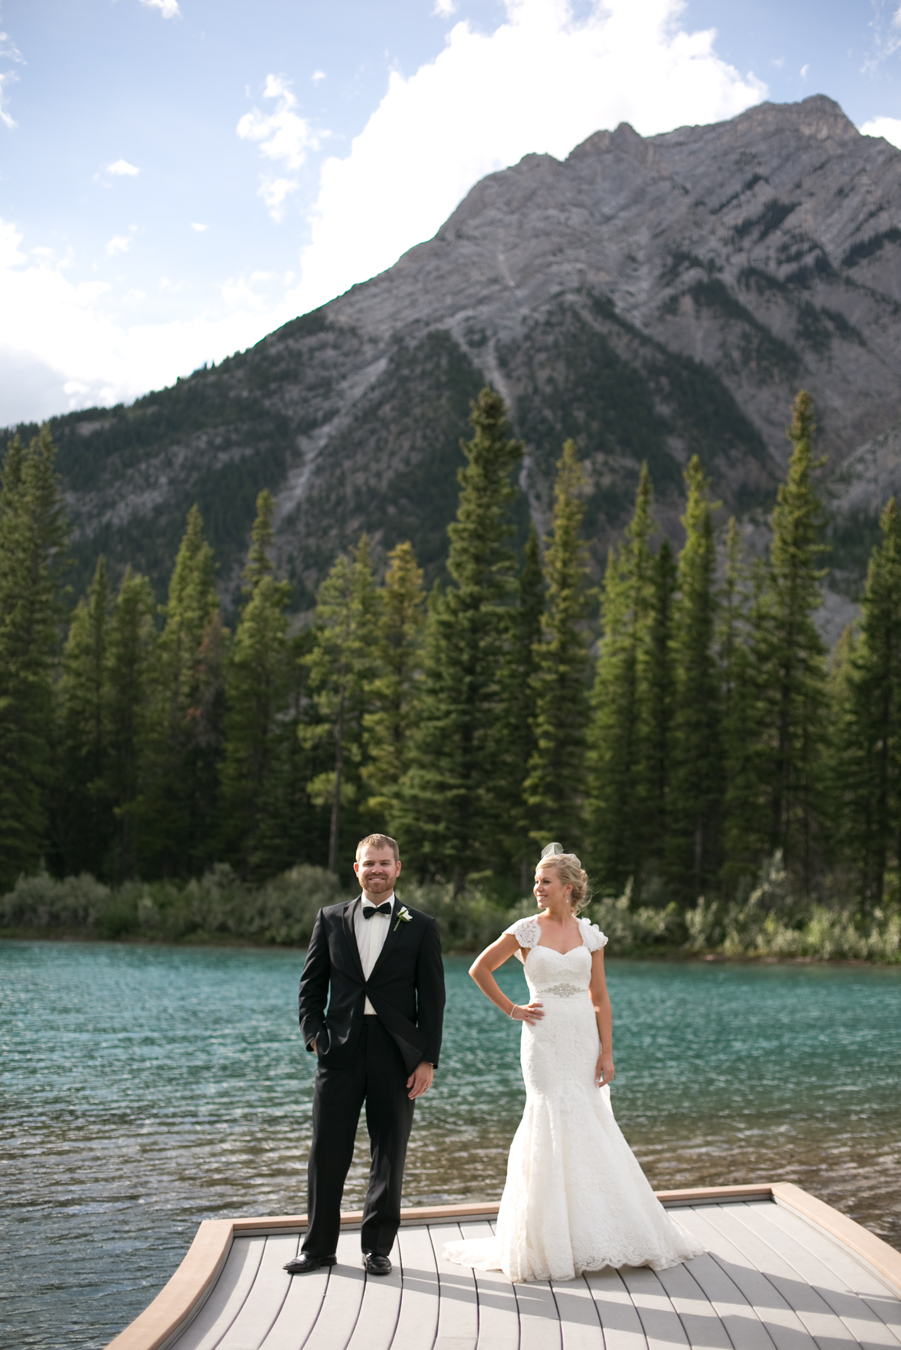 Charlene Amp Riley Married Kananaskis Wedding Photographer Modern Photography Canmore